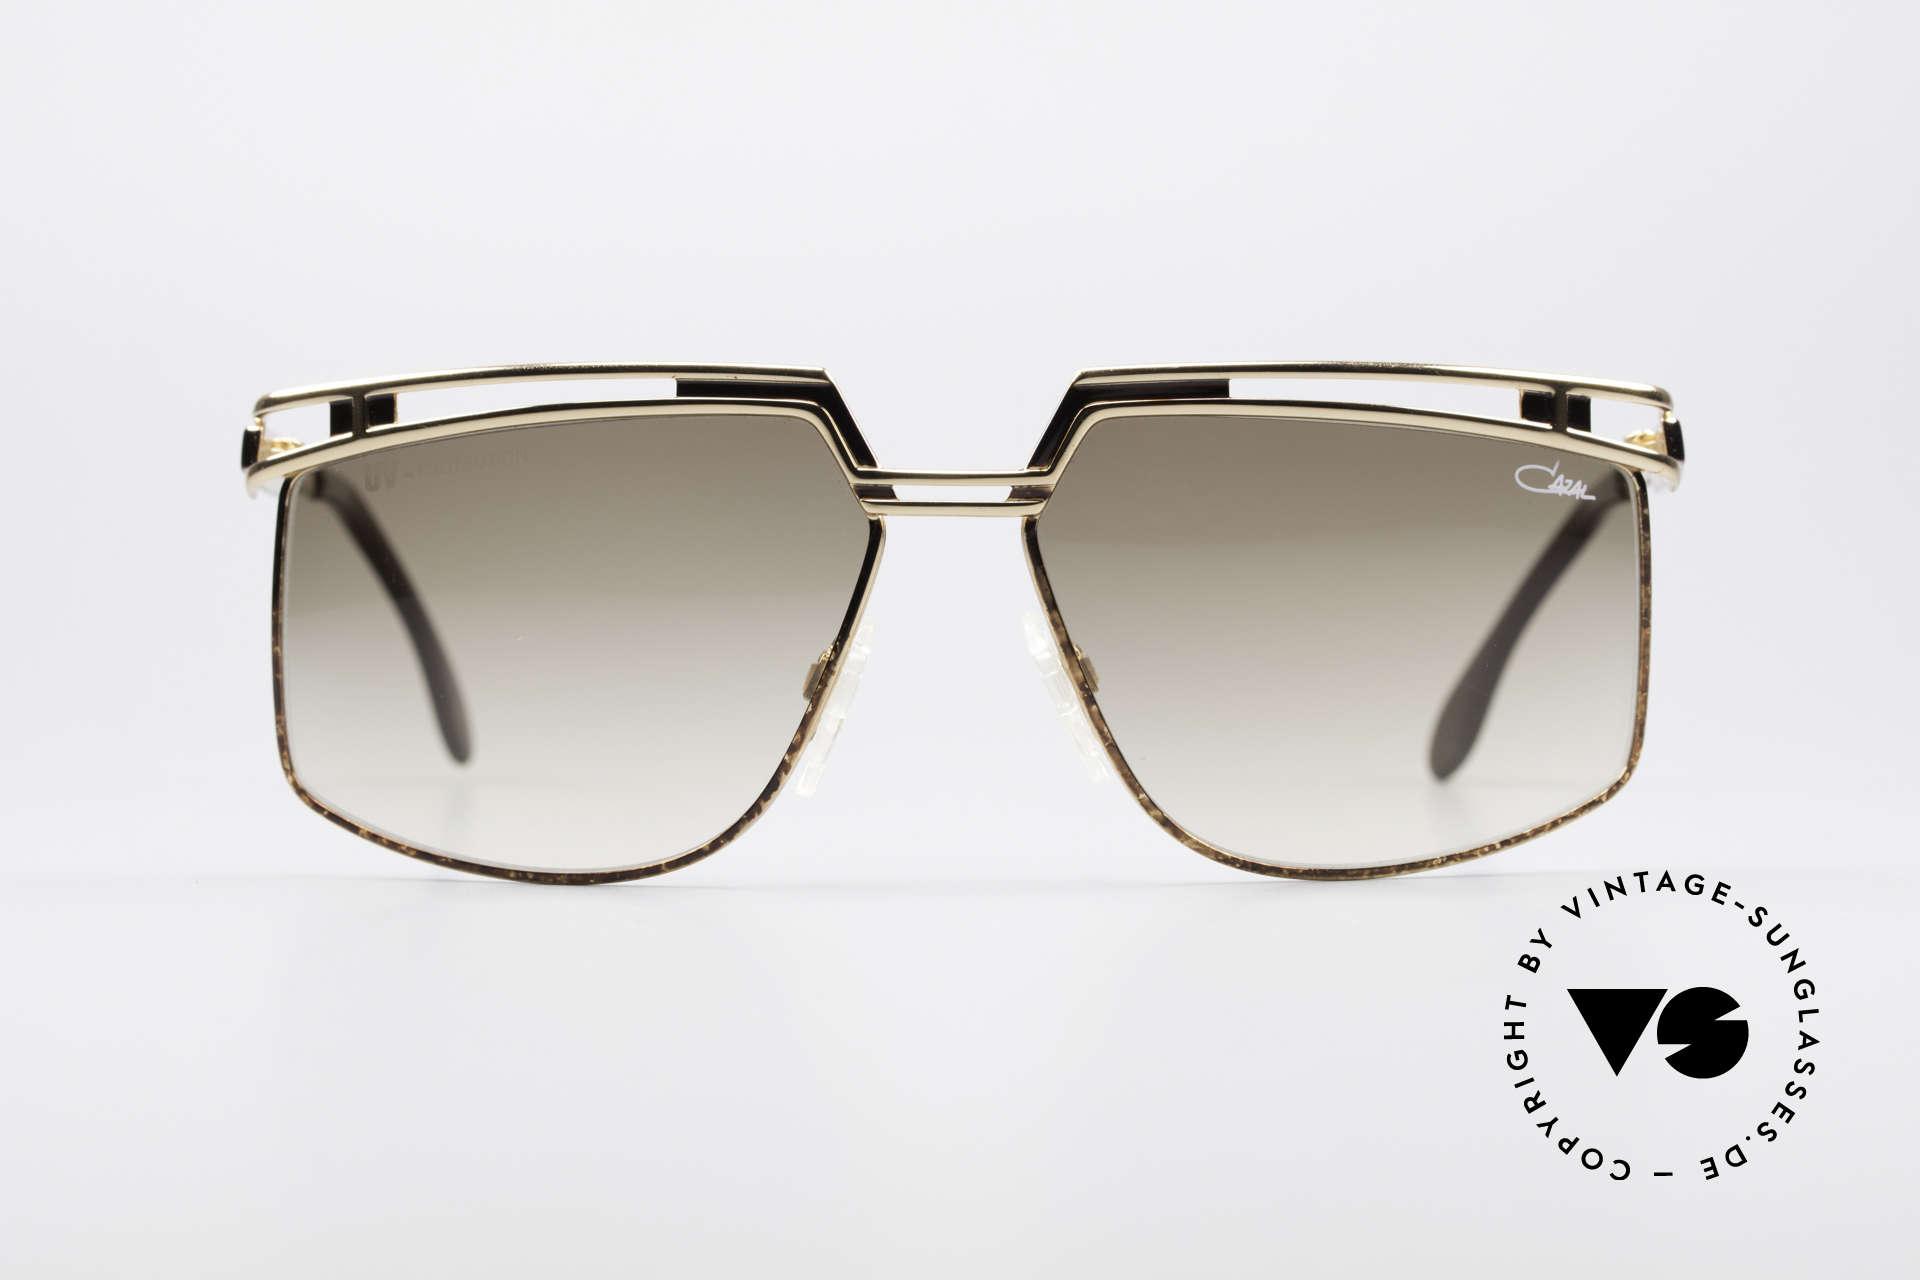 b25fc5979bd Sunglasses Cazal 957 80 s West Germany Shades